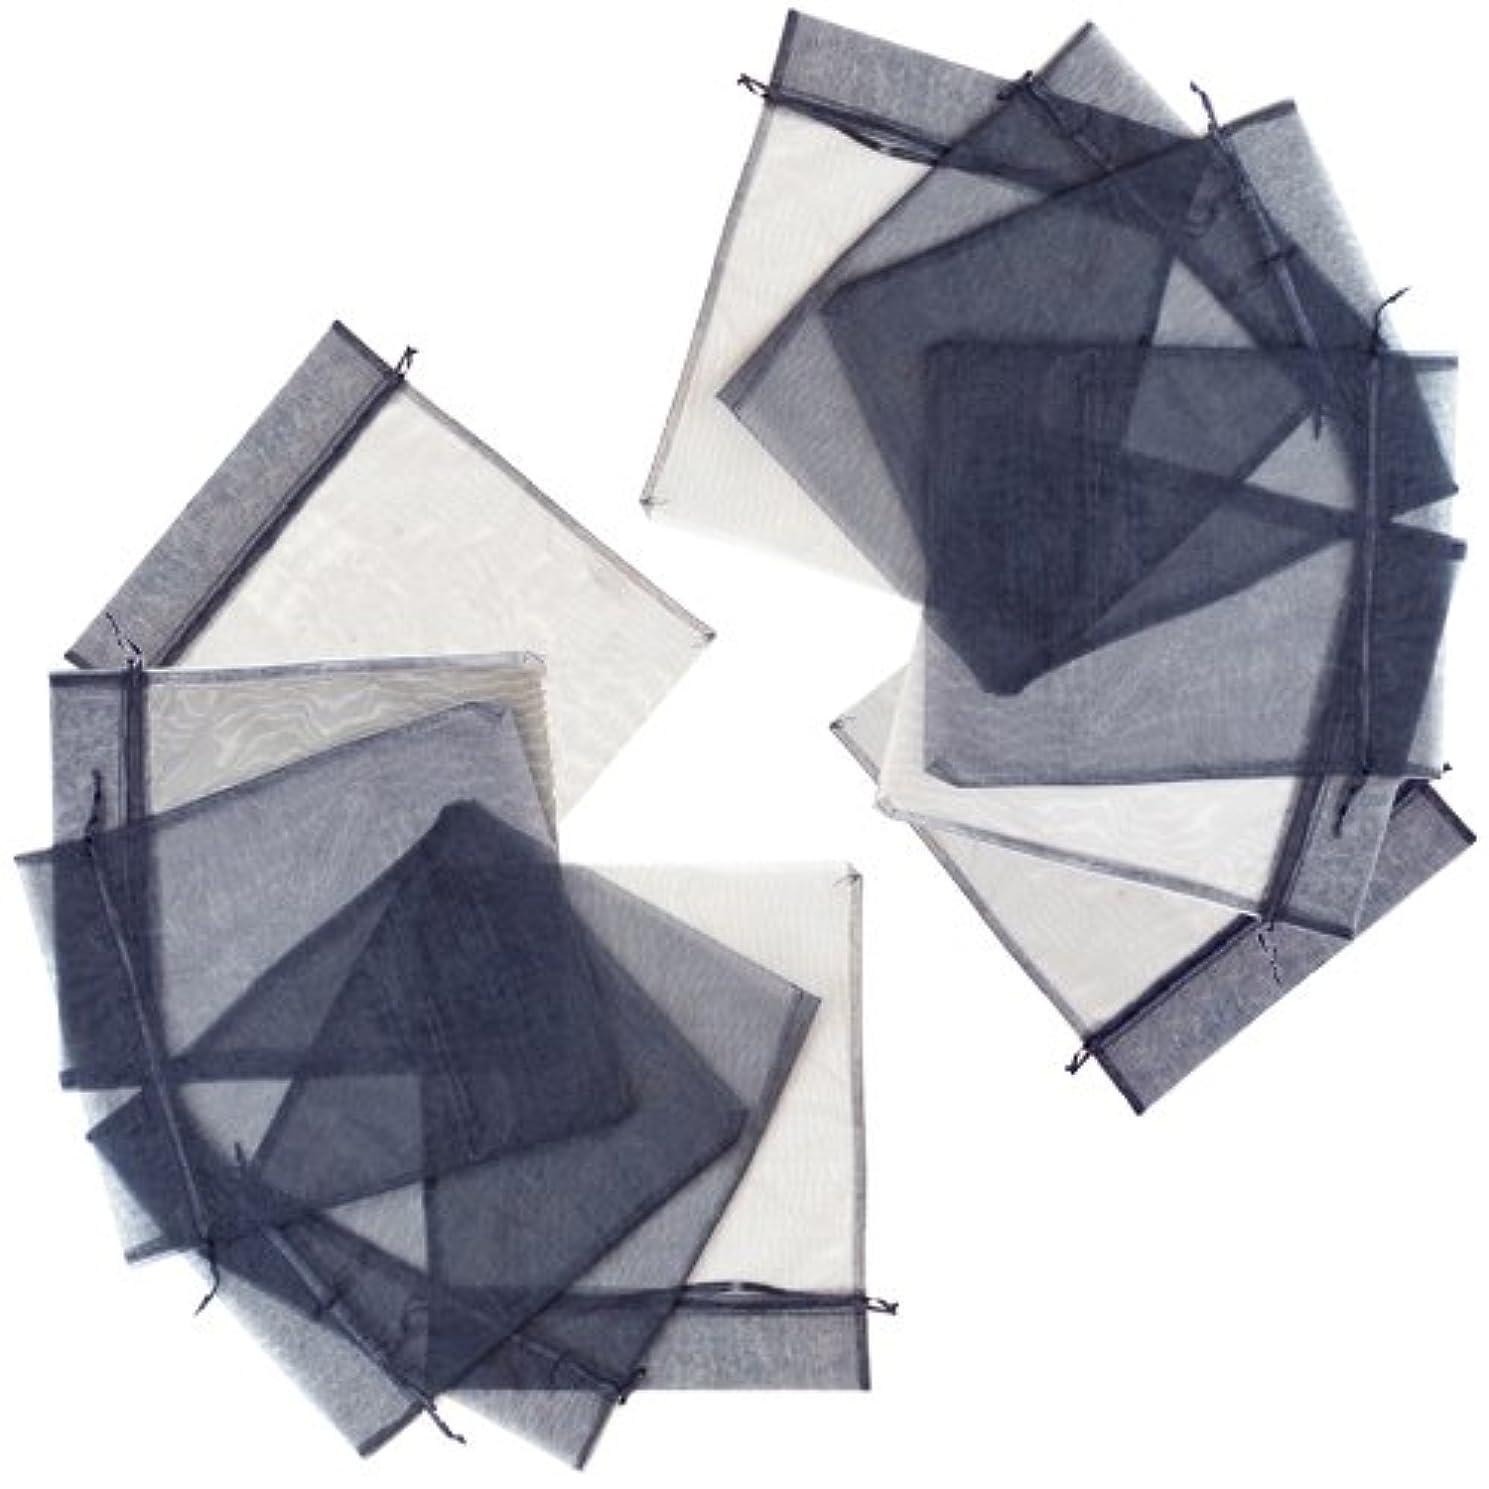 12 Large Black Organza Bags with Drawstrings (Large 20